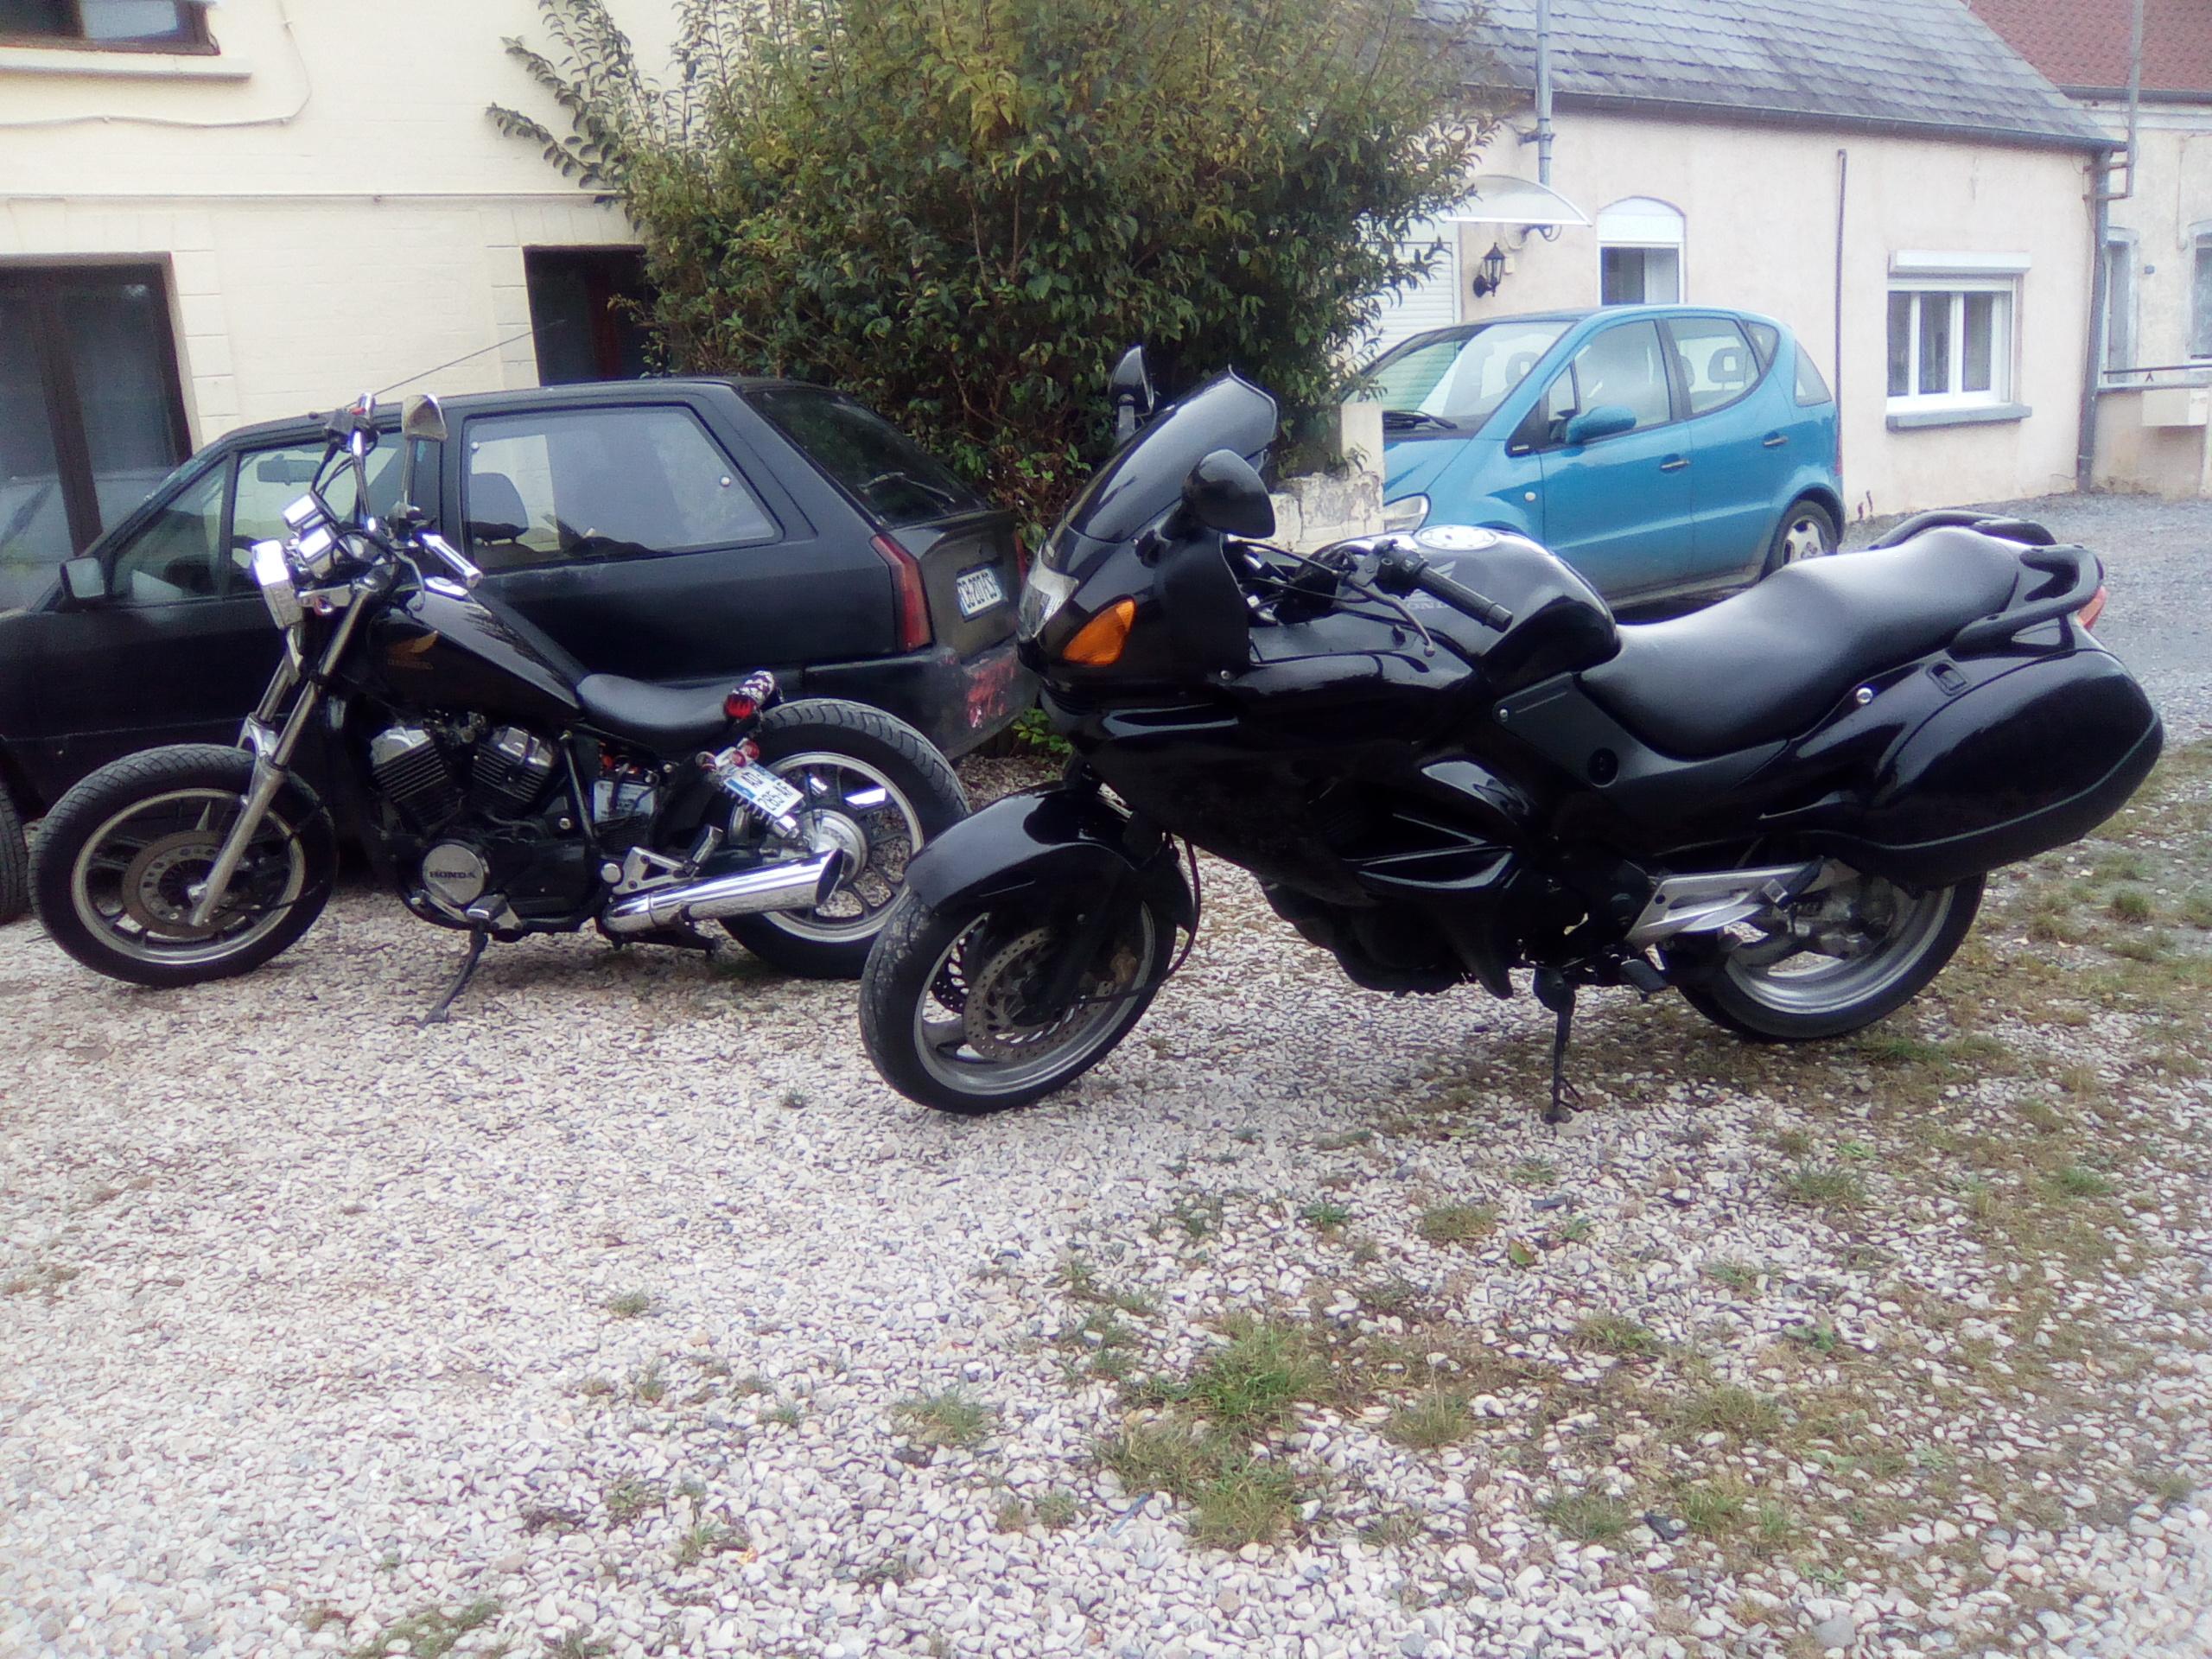 vt500c  transformation  en bobber, mes motos Deauville, Shadow 600 225902IMG20161022132426